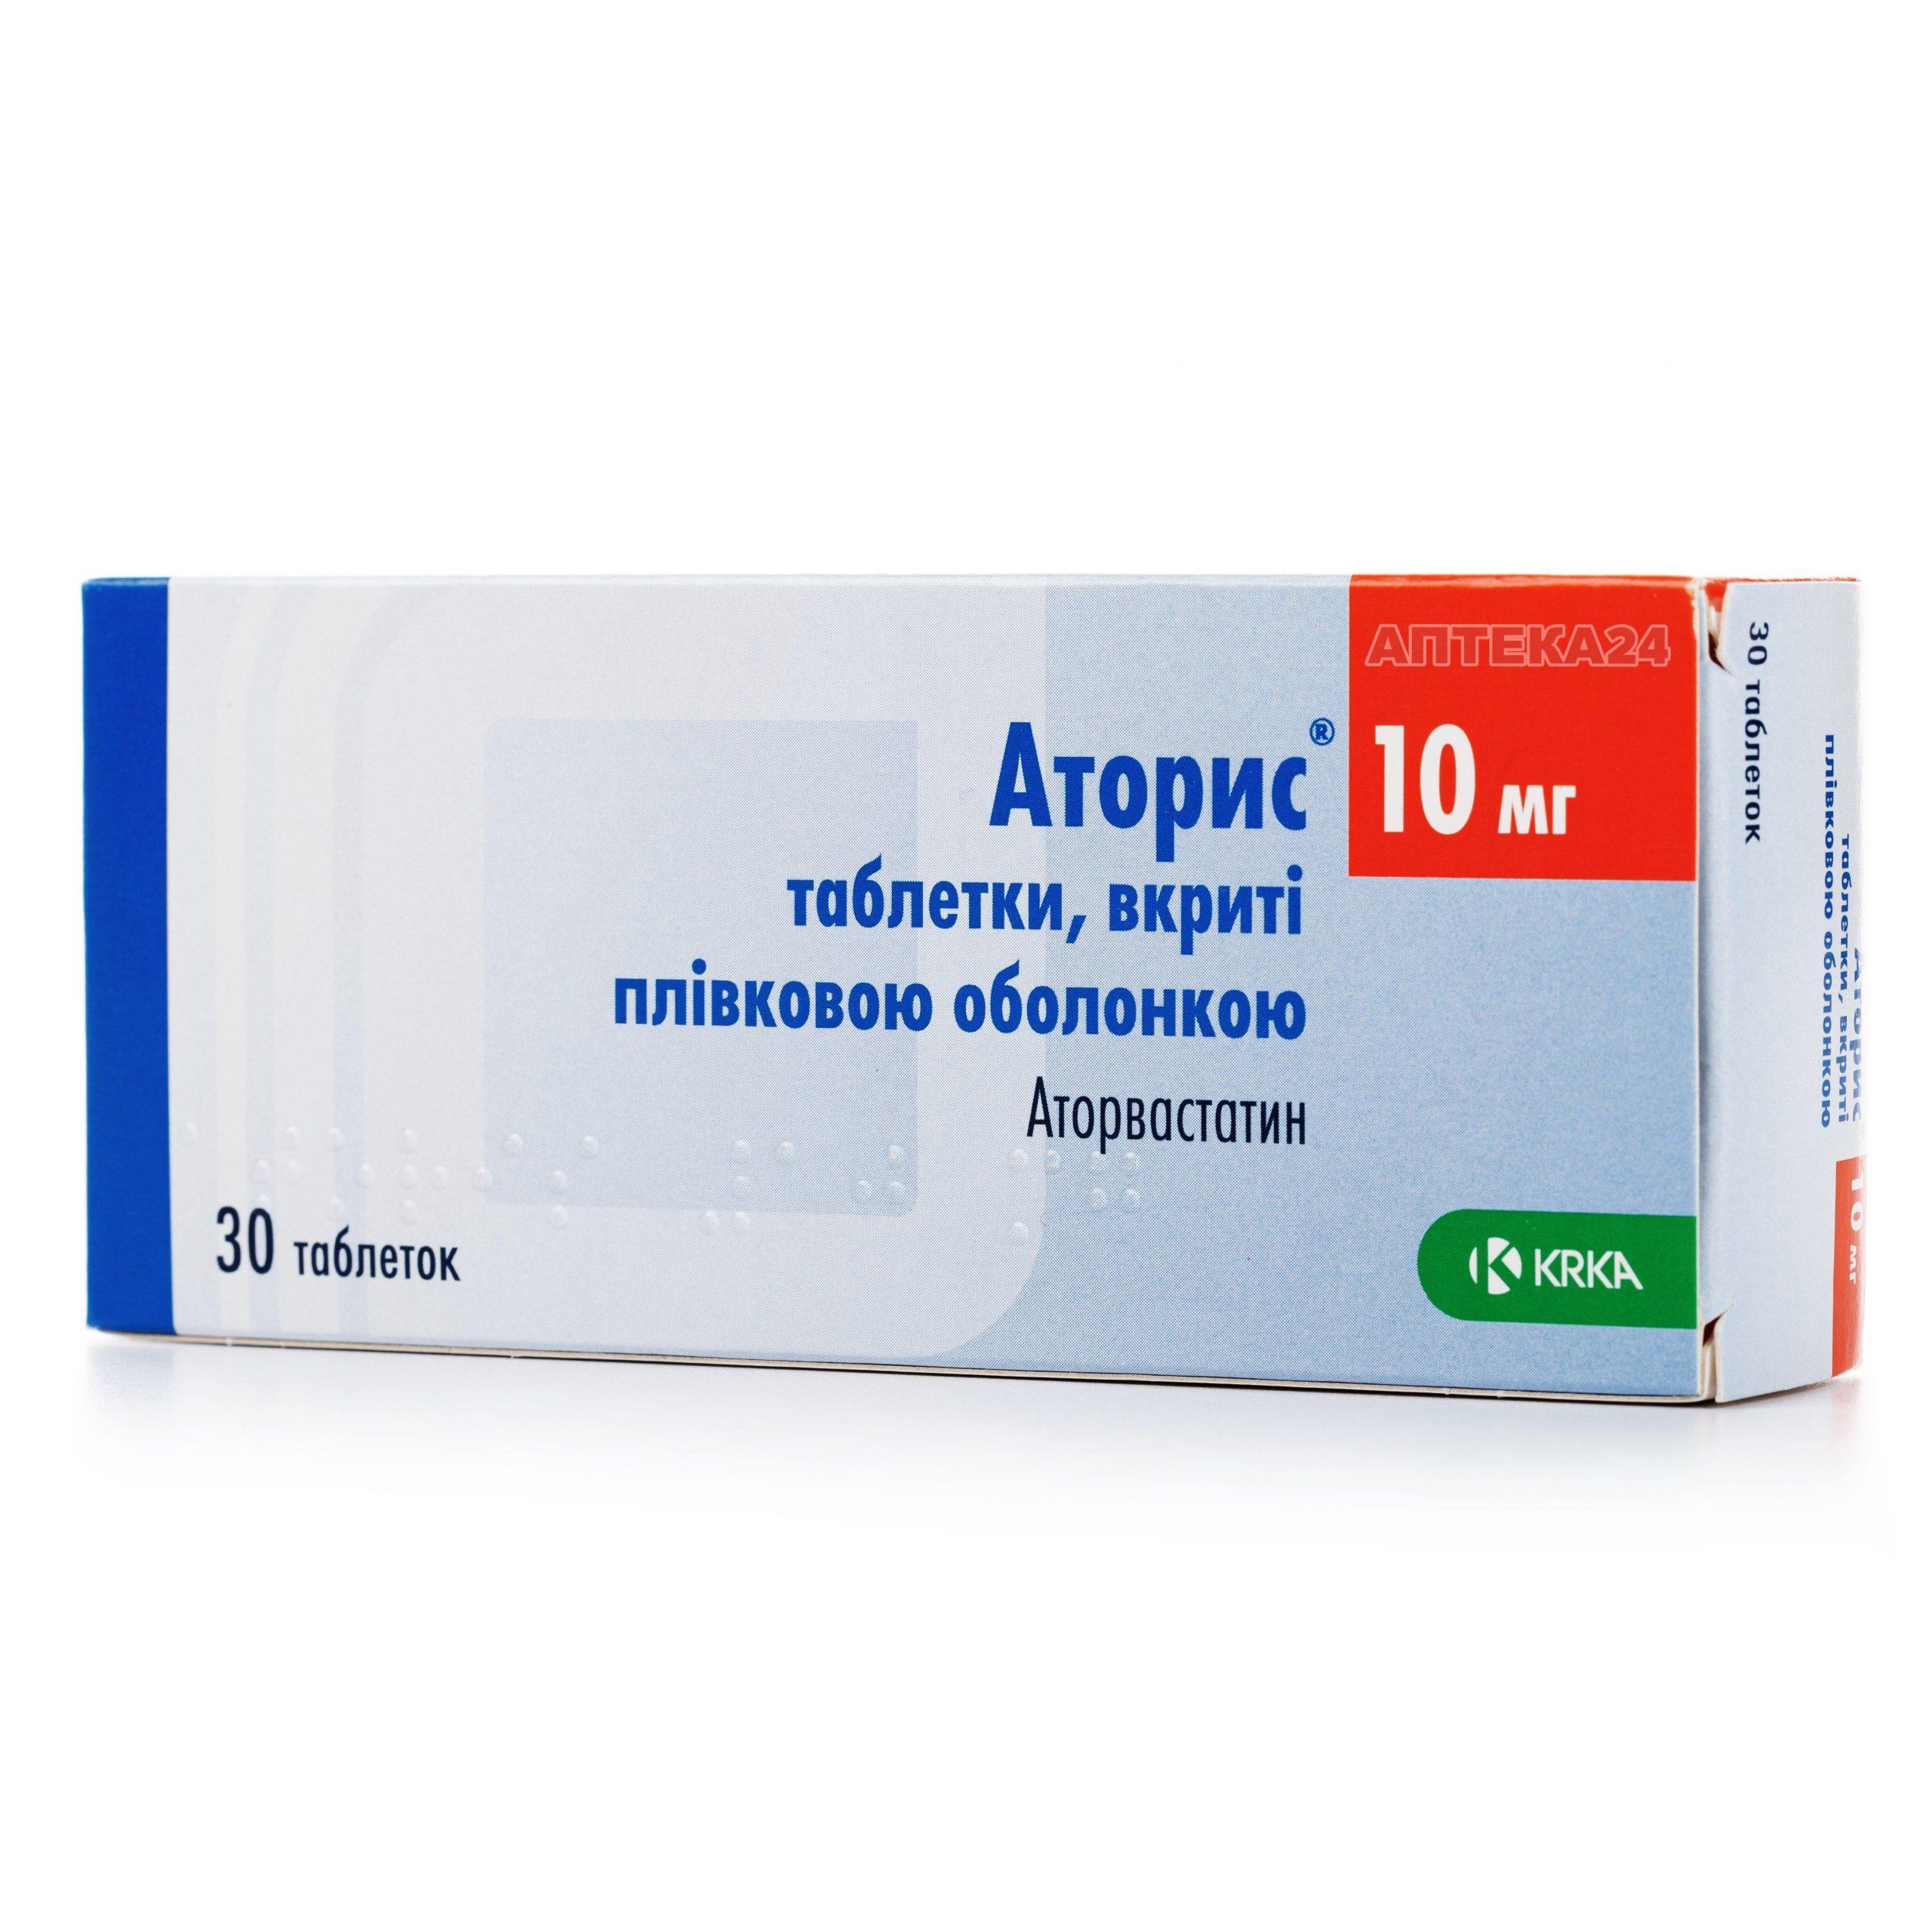 Аторис таблетки 10 мг N30_60060e0e25a6a.jpeg